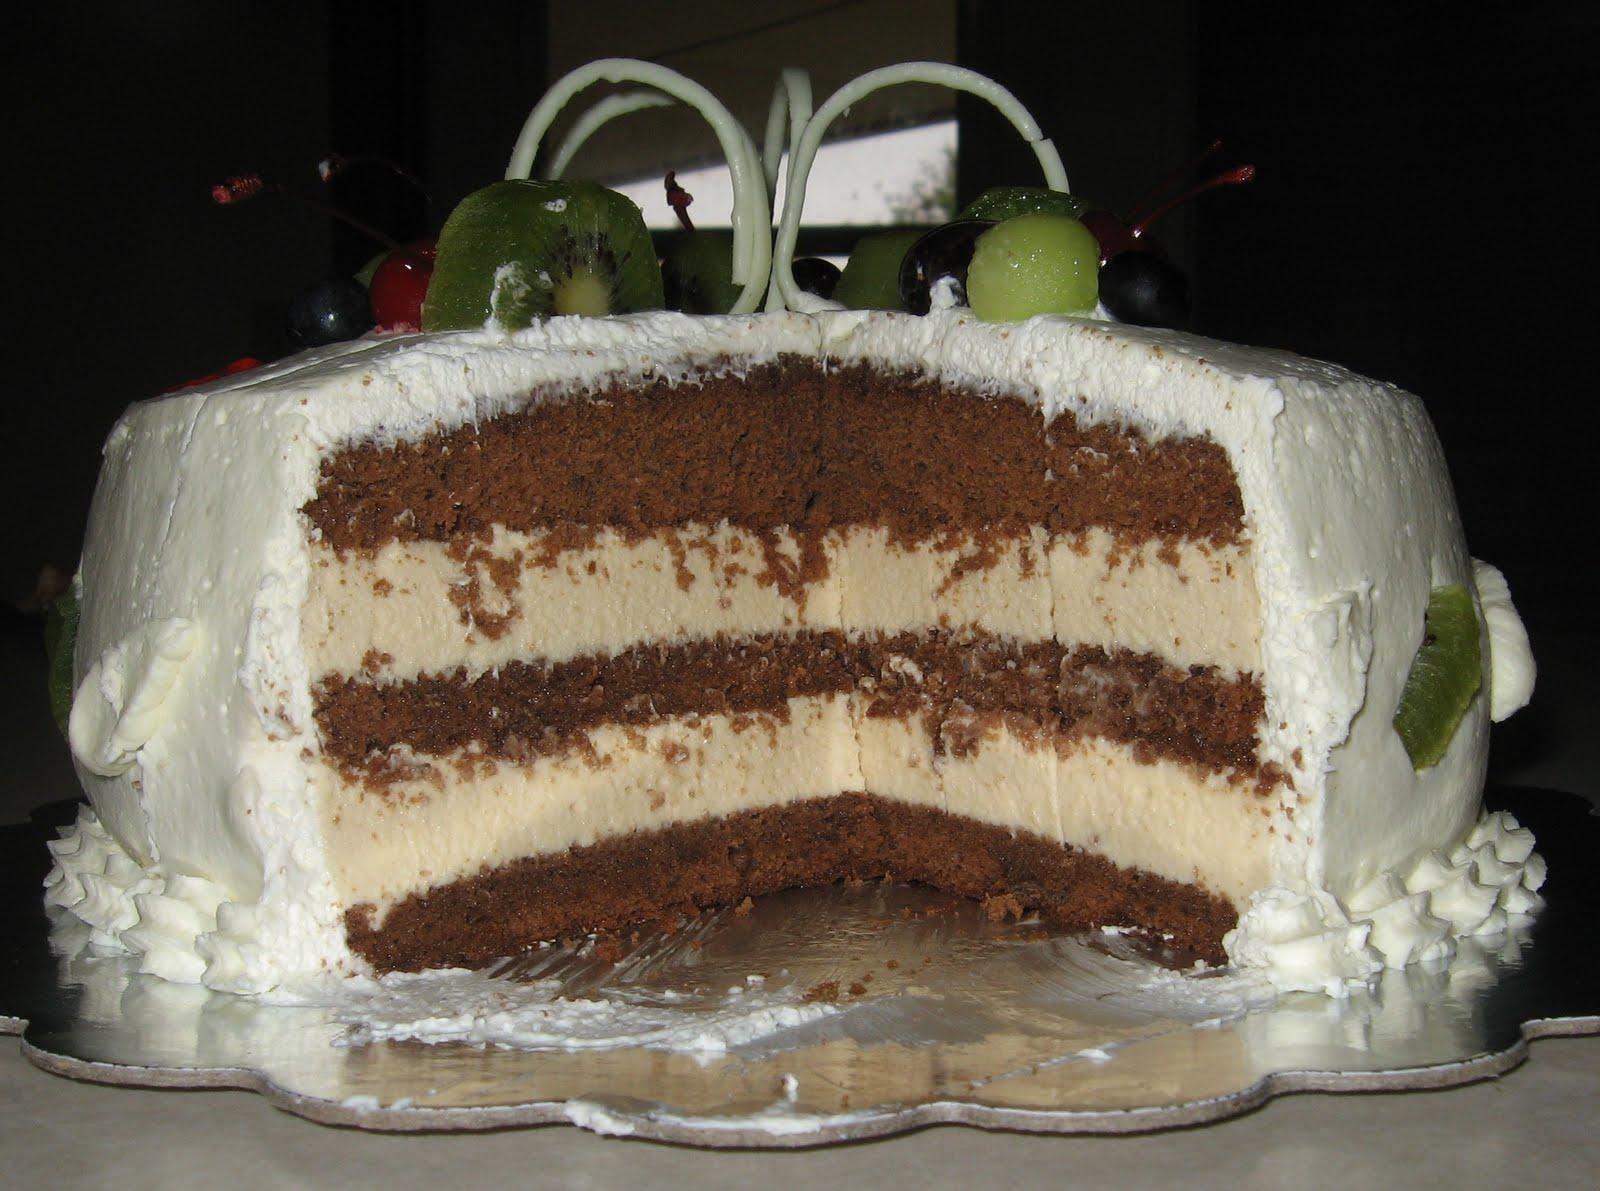 Chocolate Birthday Cake, Chocolate Cake, Birthady Cake